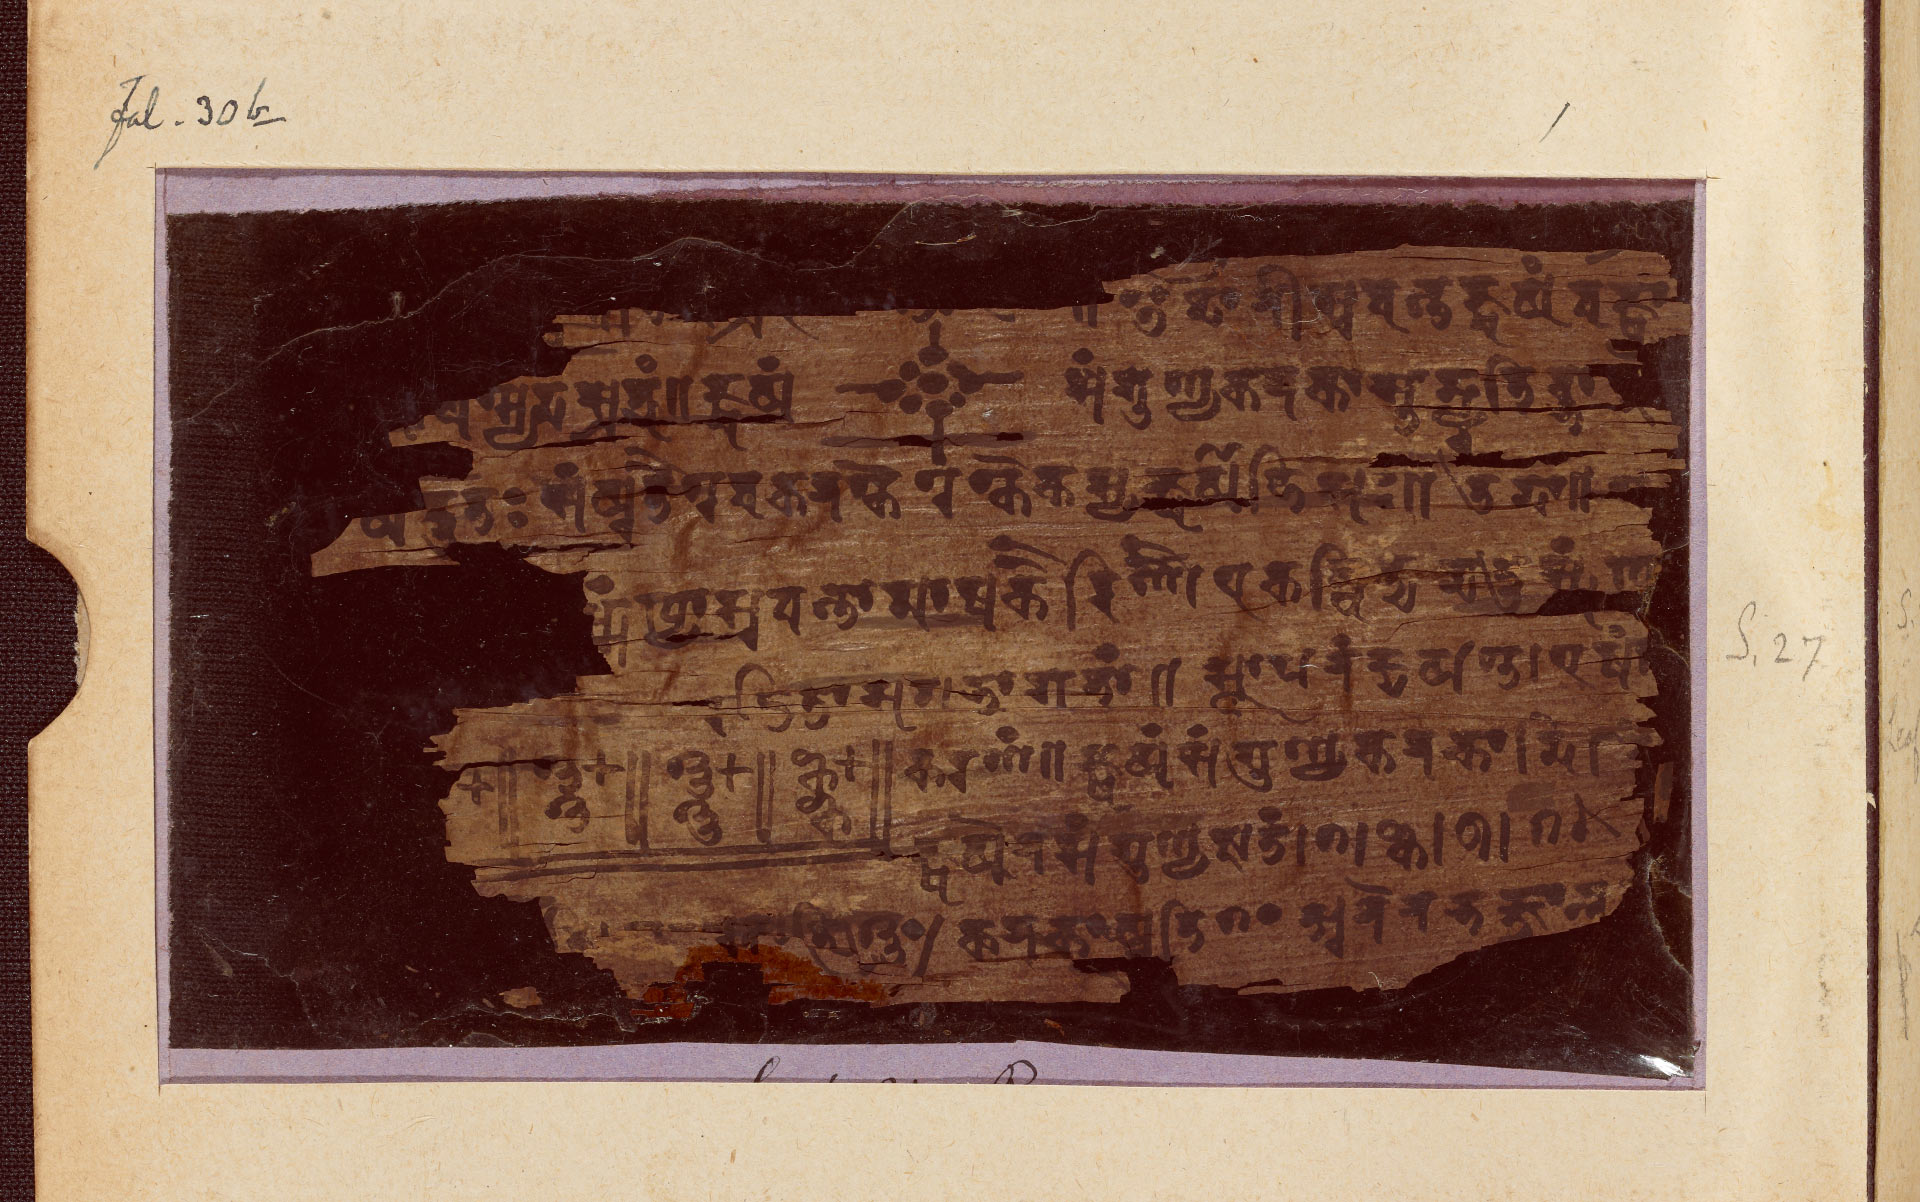 Manuscript Review 'The Indica' or 'Al-bayruni's India,' by Al-Bayruni